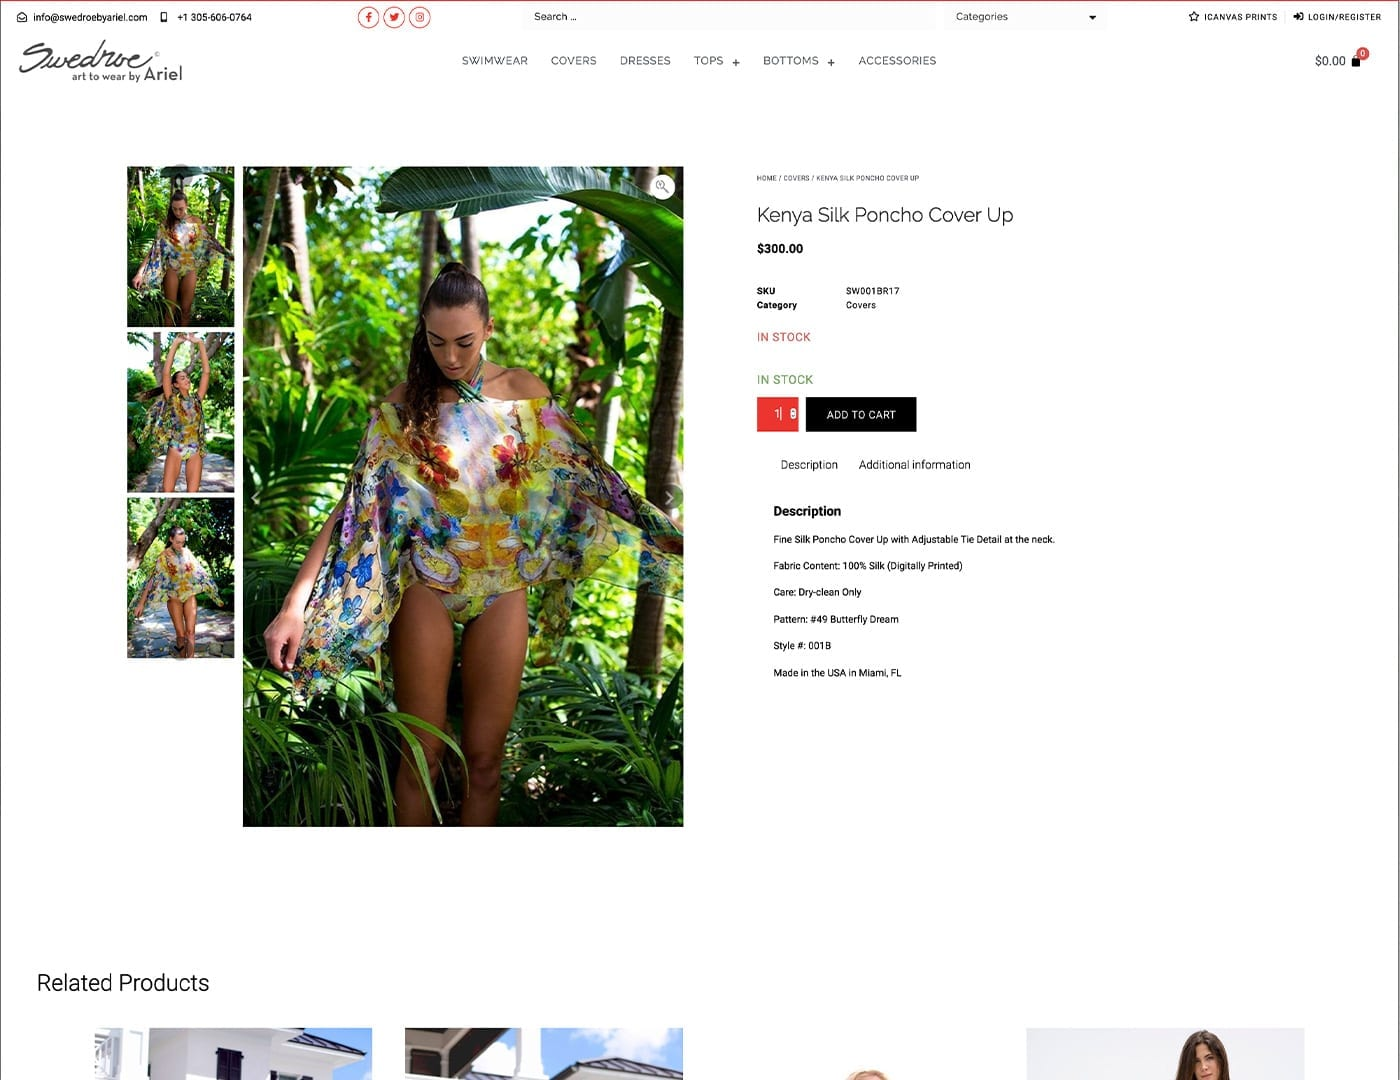 Single Product Layout – swedroebyariel.com - Online Store built with bizProWeb - Website Design by sliStudios | Miami